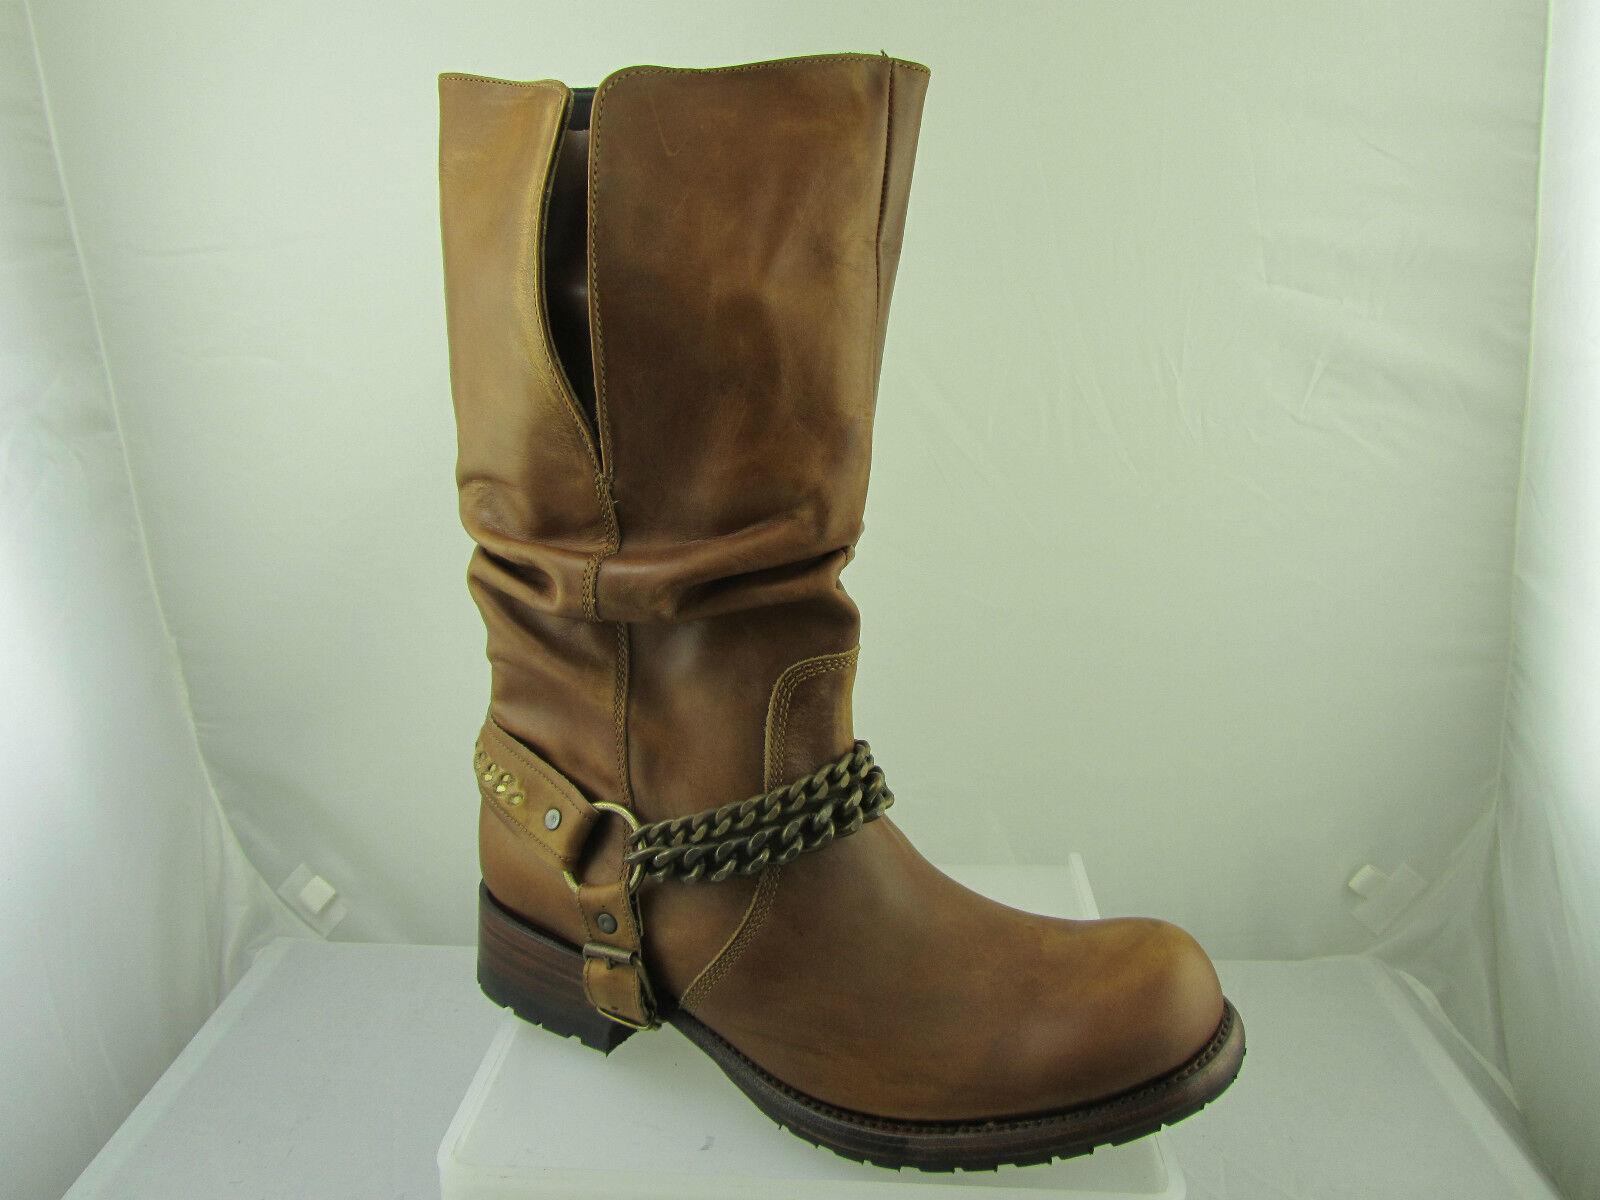 Sendra 9374 Unisex Cowboy Boots Tan Leather Brown Western Biker Mid Calf